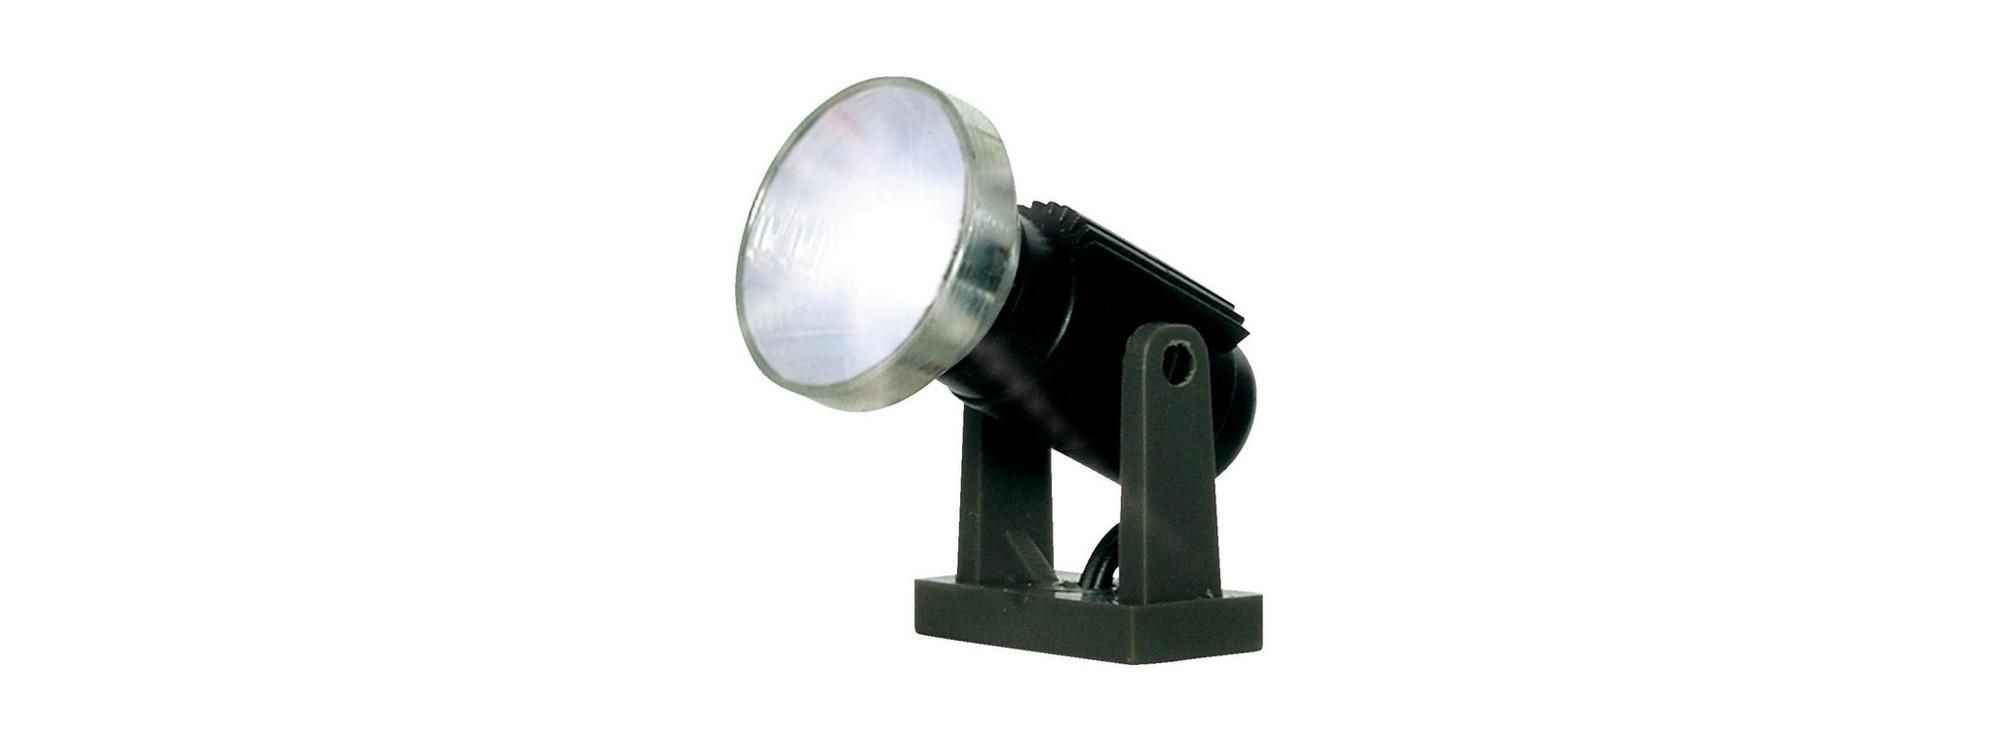 Viessmann 6530 Flutlichtstrahler Nieder LED | Beleuchtung Spur N/H0